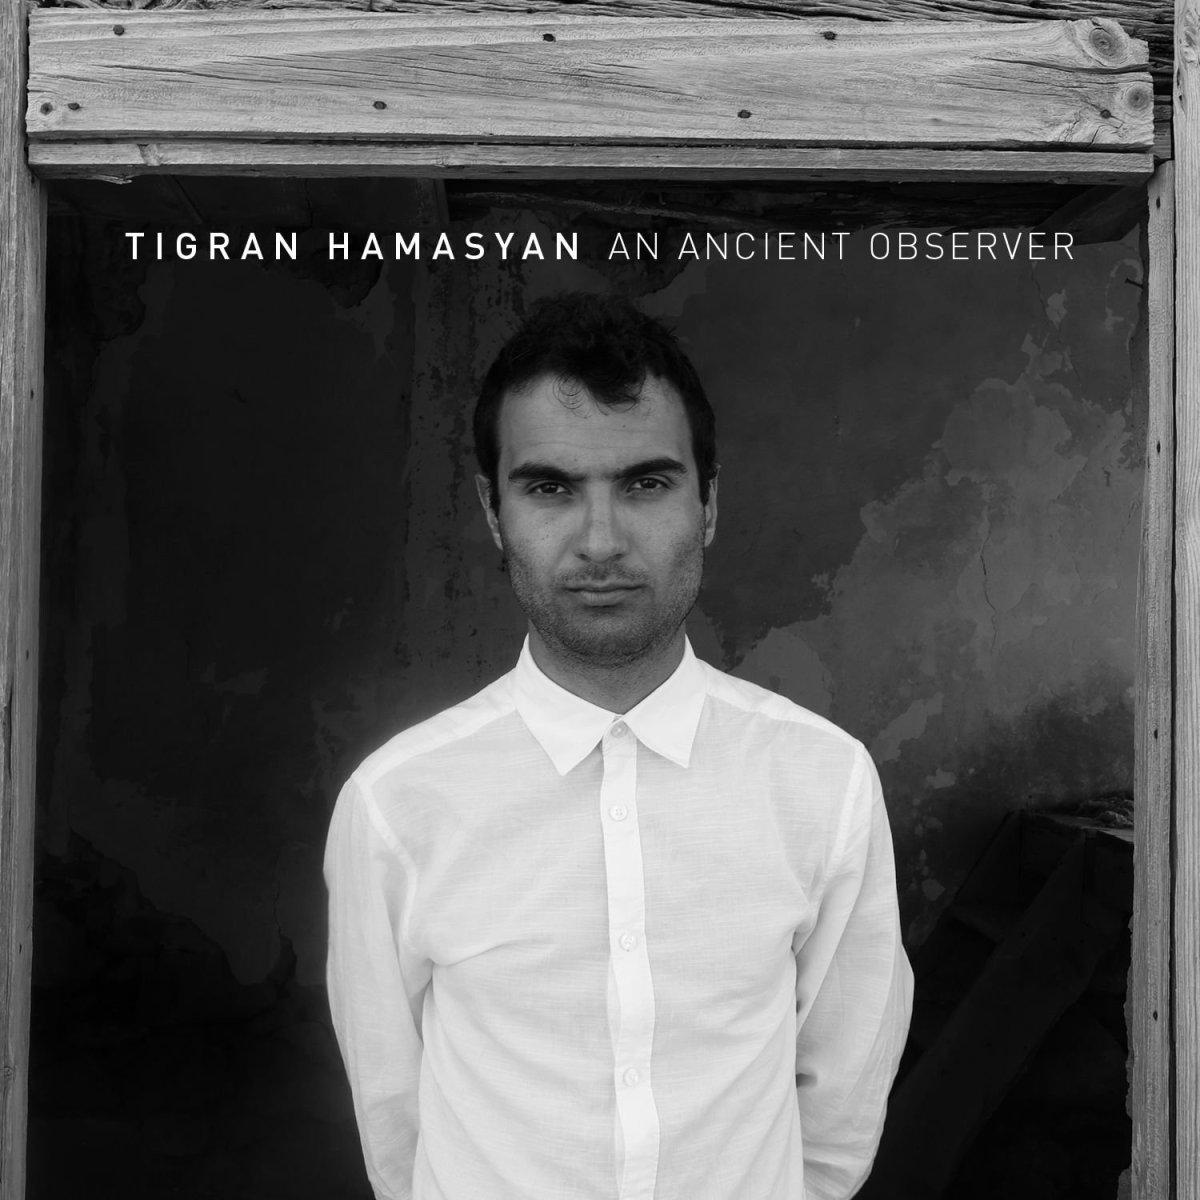 April 2017, Best Jazz Album: An Ancient Observer by TigranHamasyan